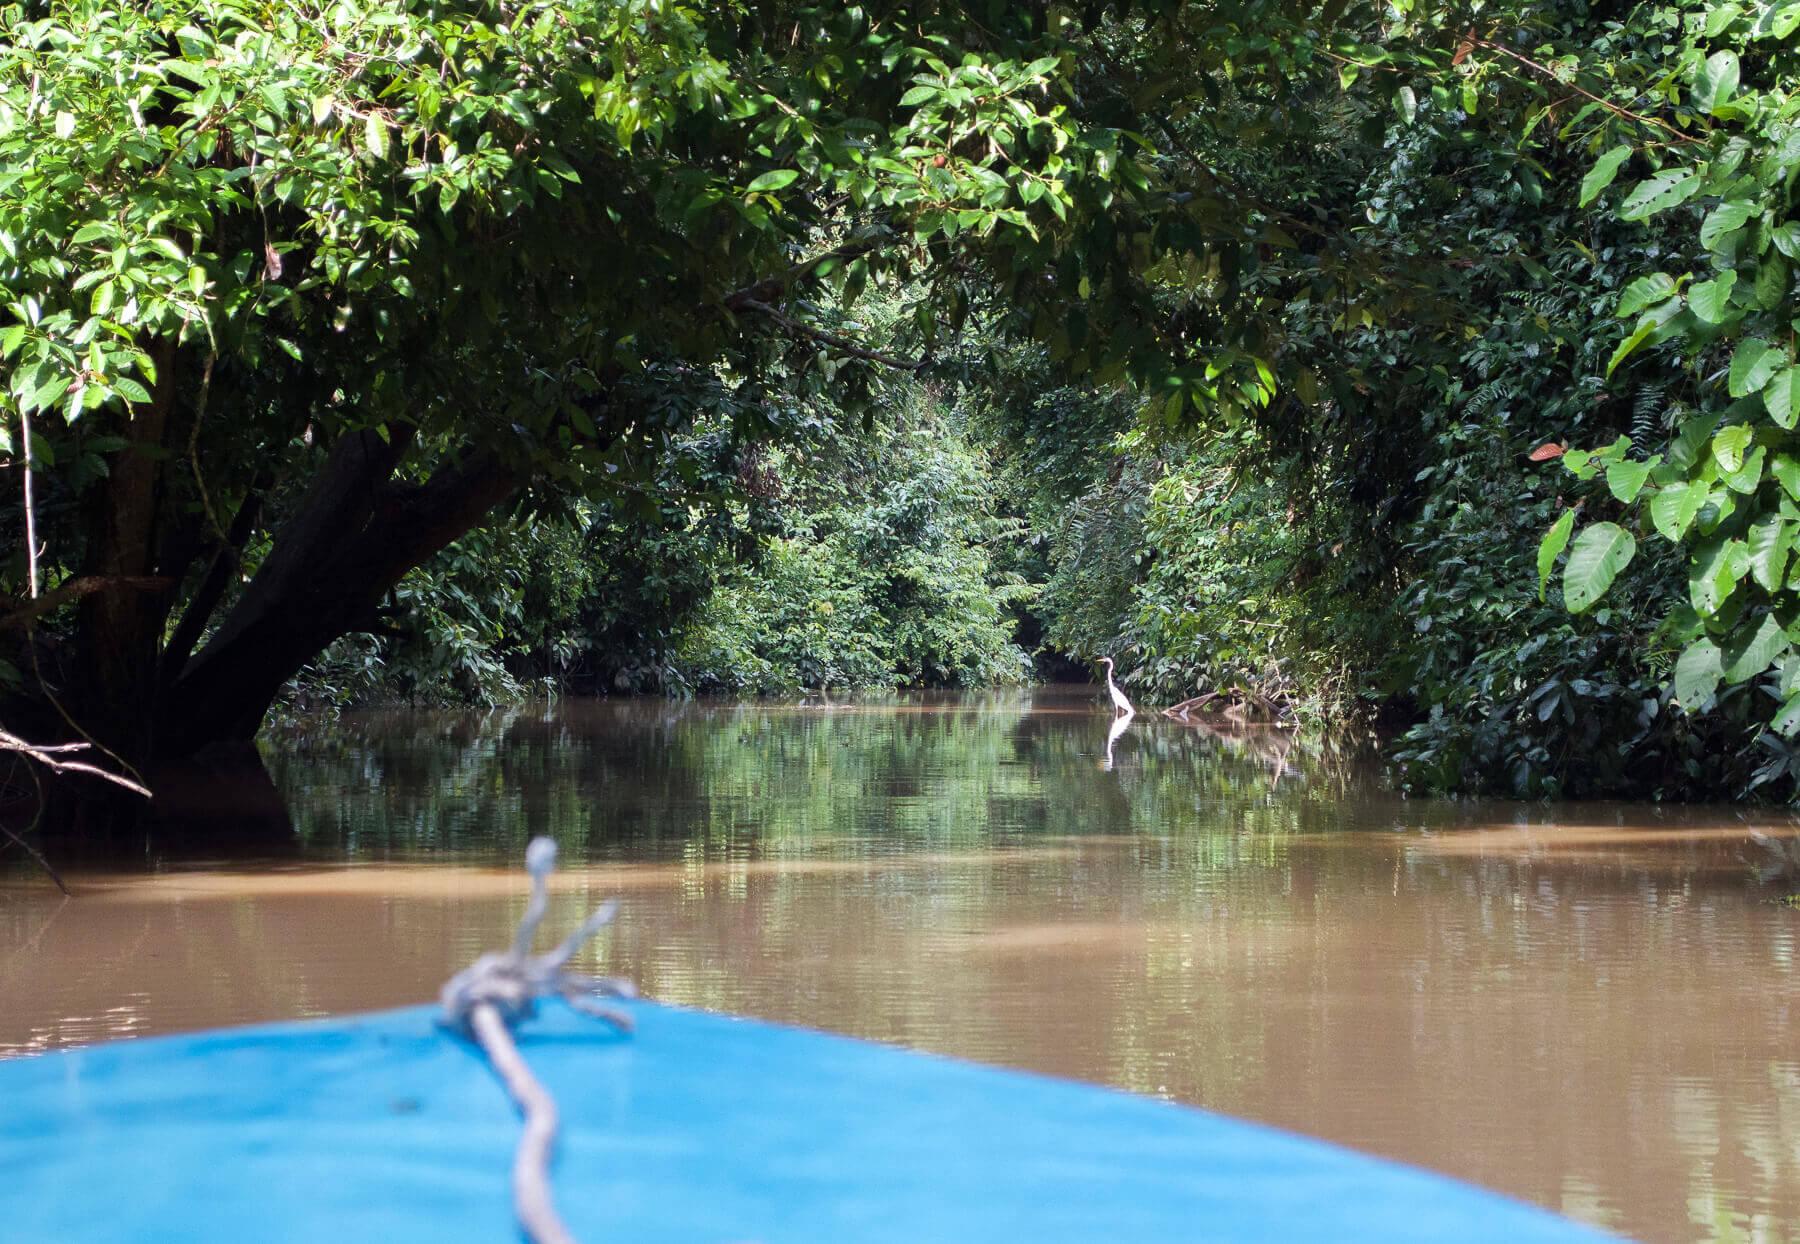 Herron sitting in the Kinabatangan River